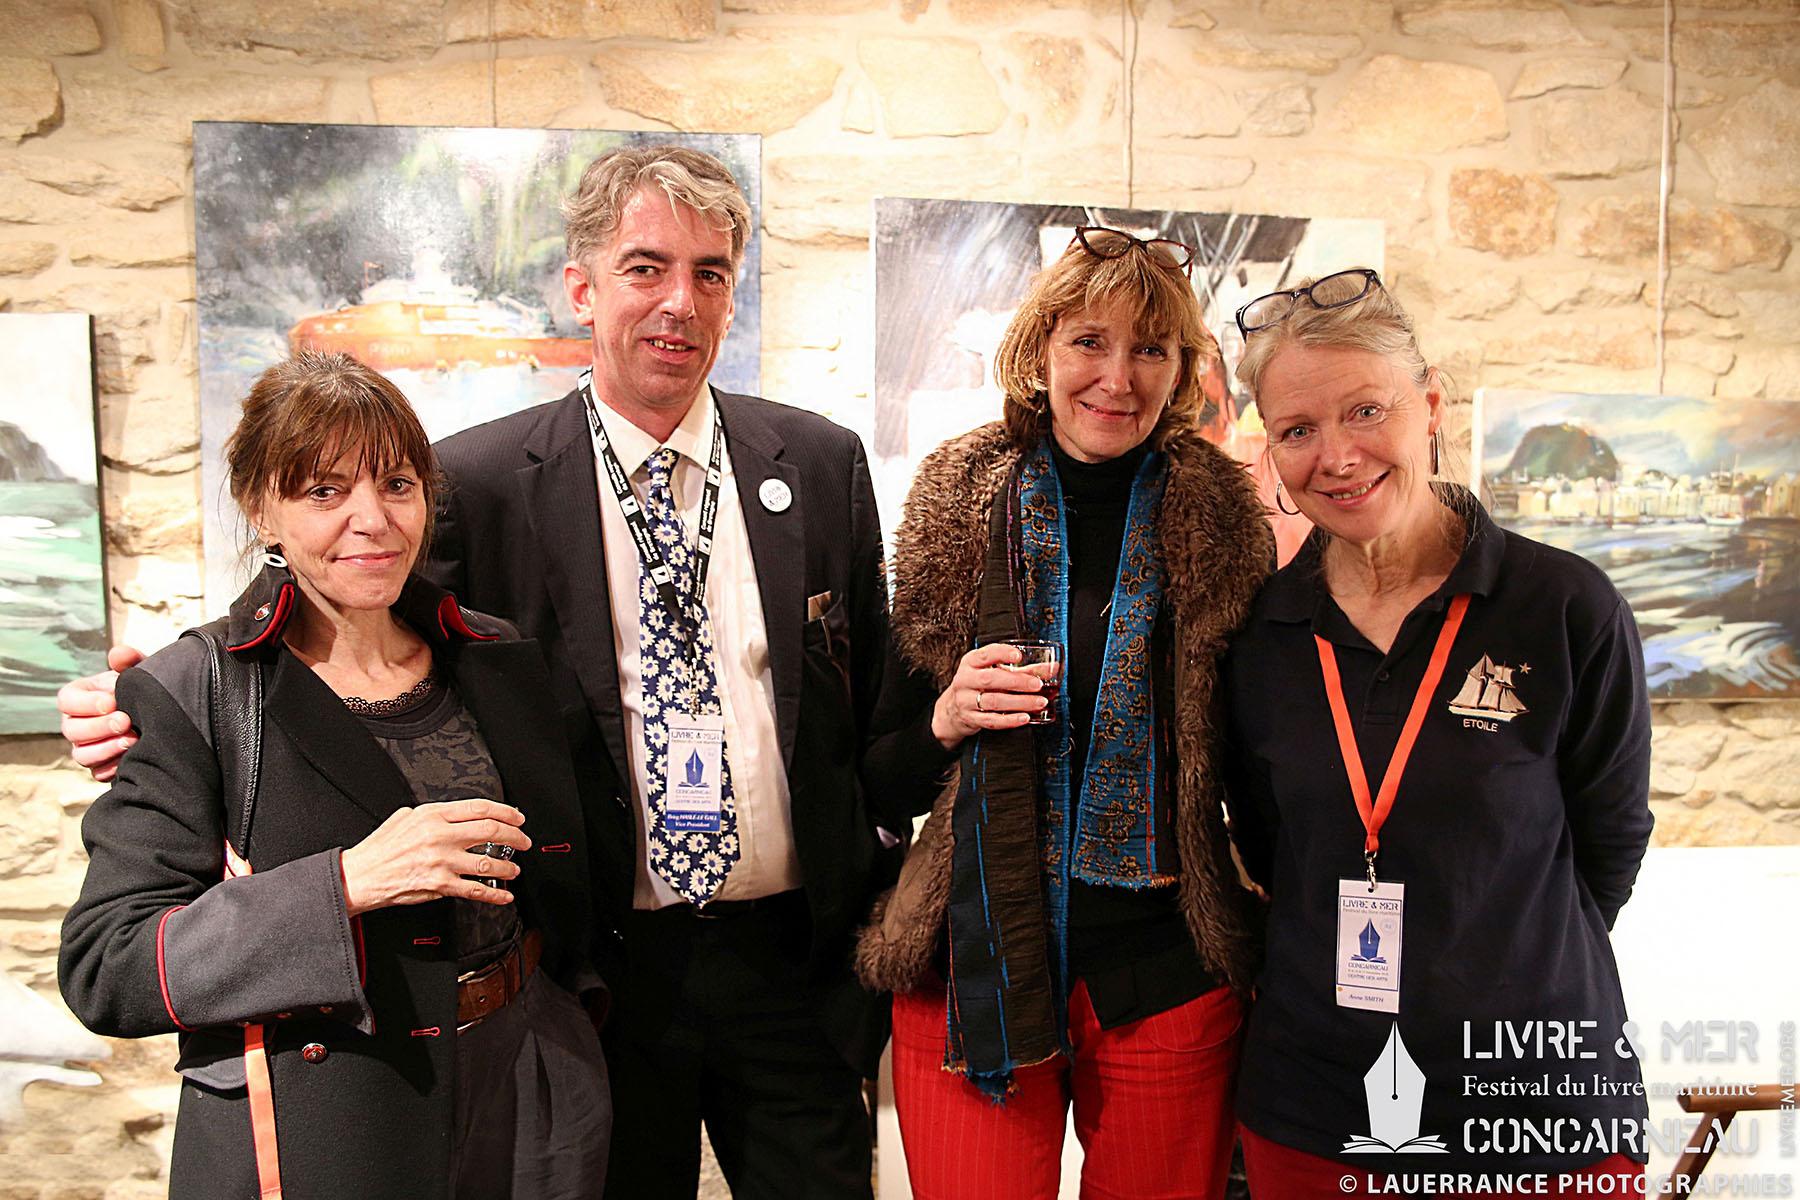 Ève Tharlet, BHLG, Brigitte Luciani & Anne Smith © Lauerrance Photographies